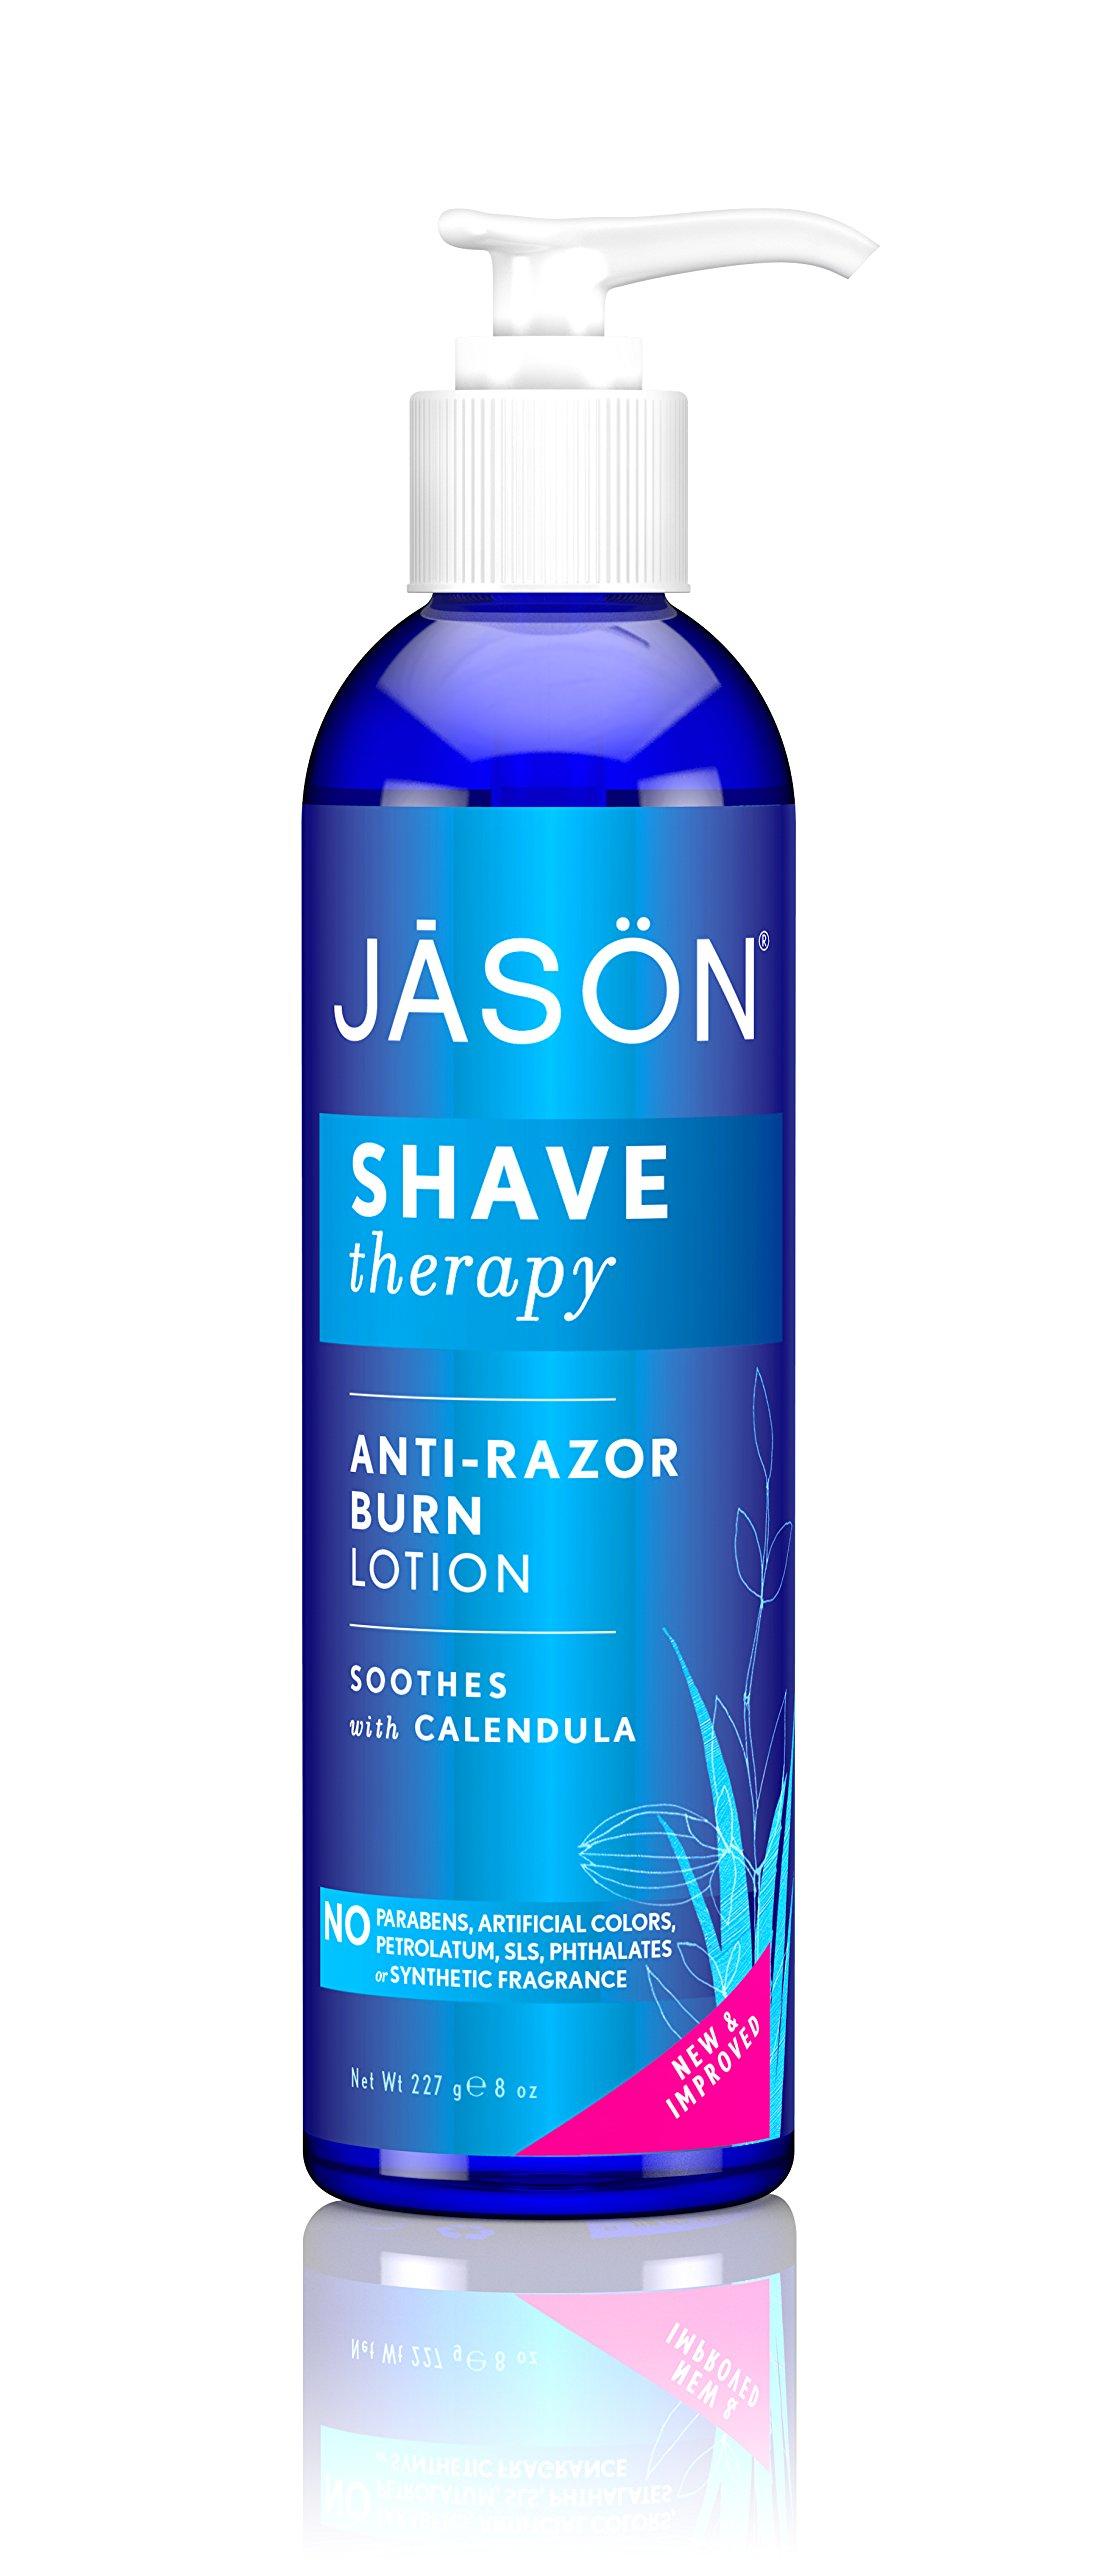 JASON Anti-Razor Burn Shaving Lotion, 8 Ounce